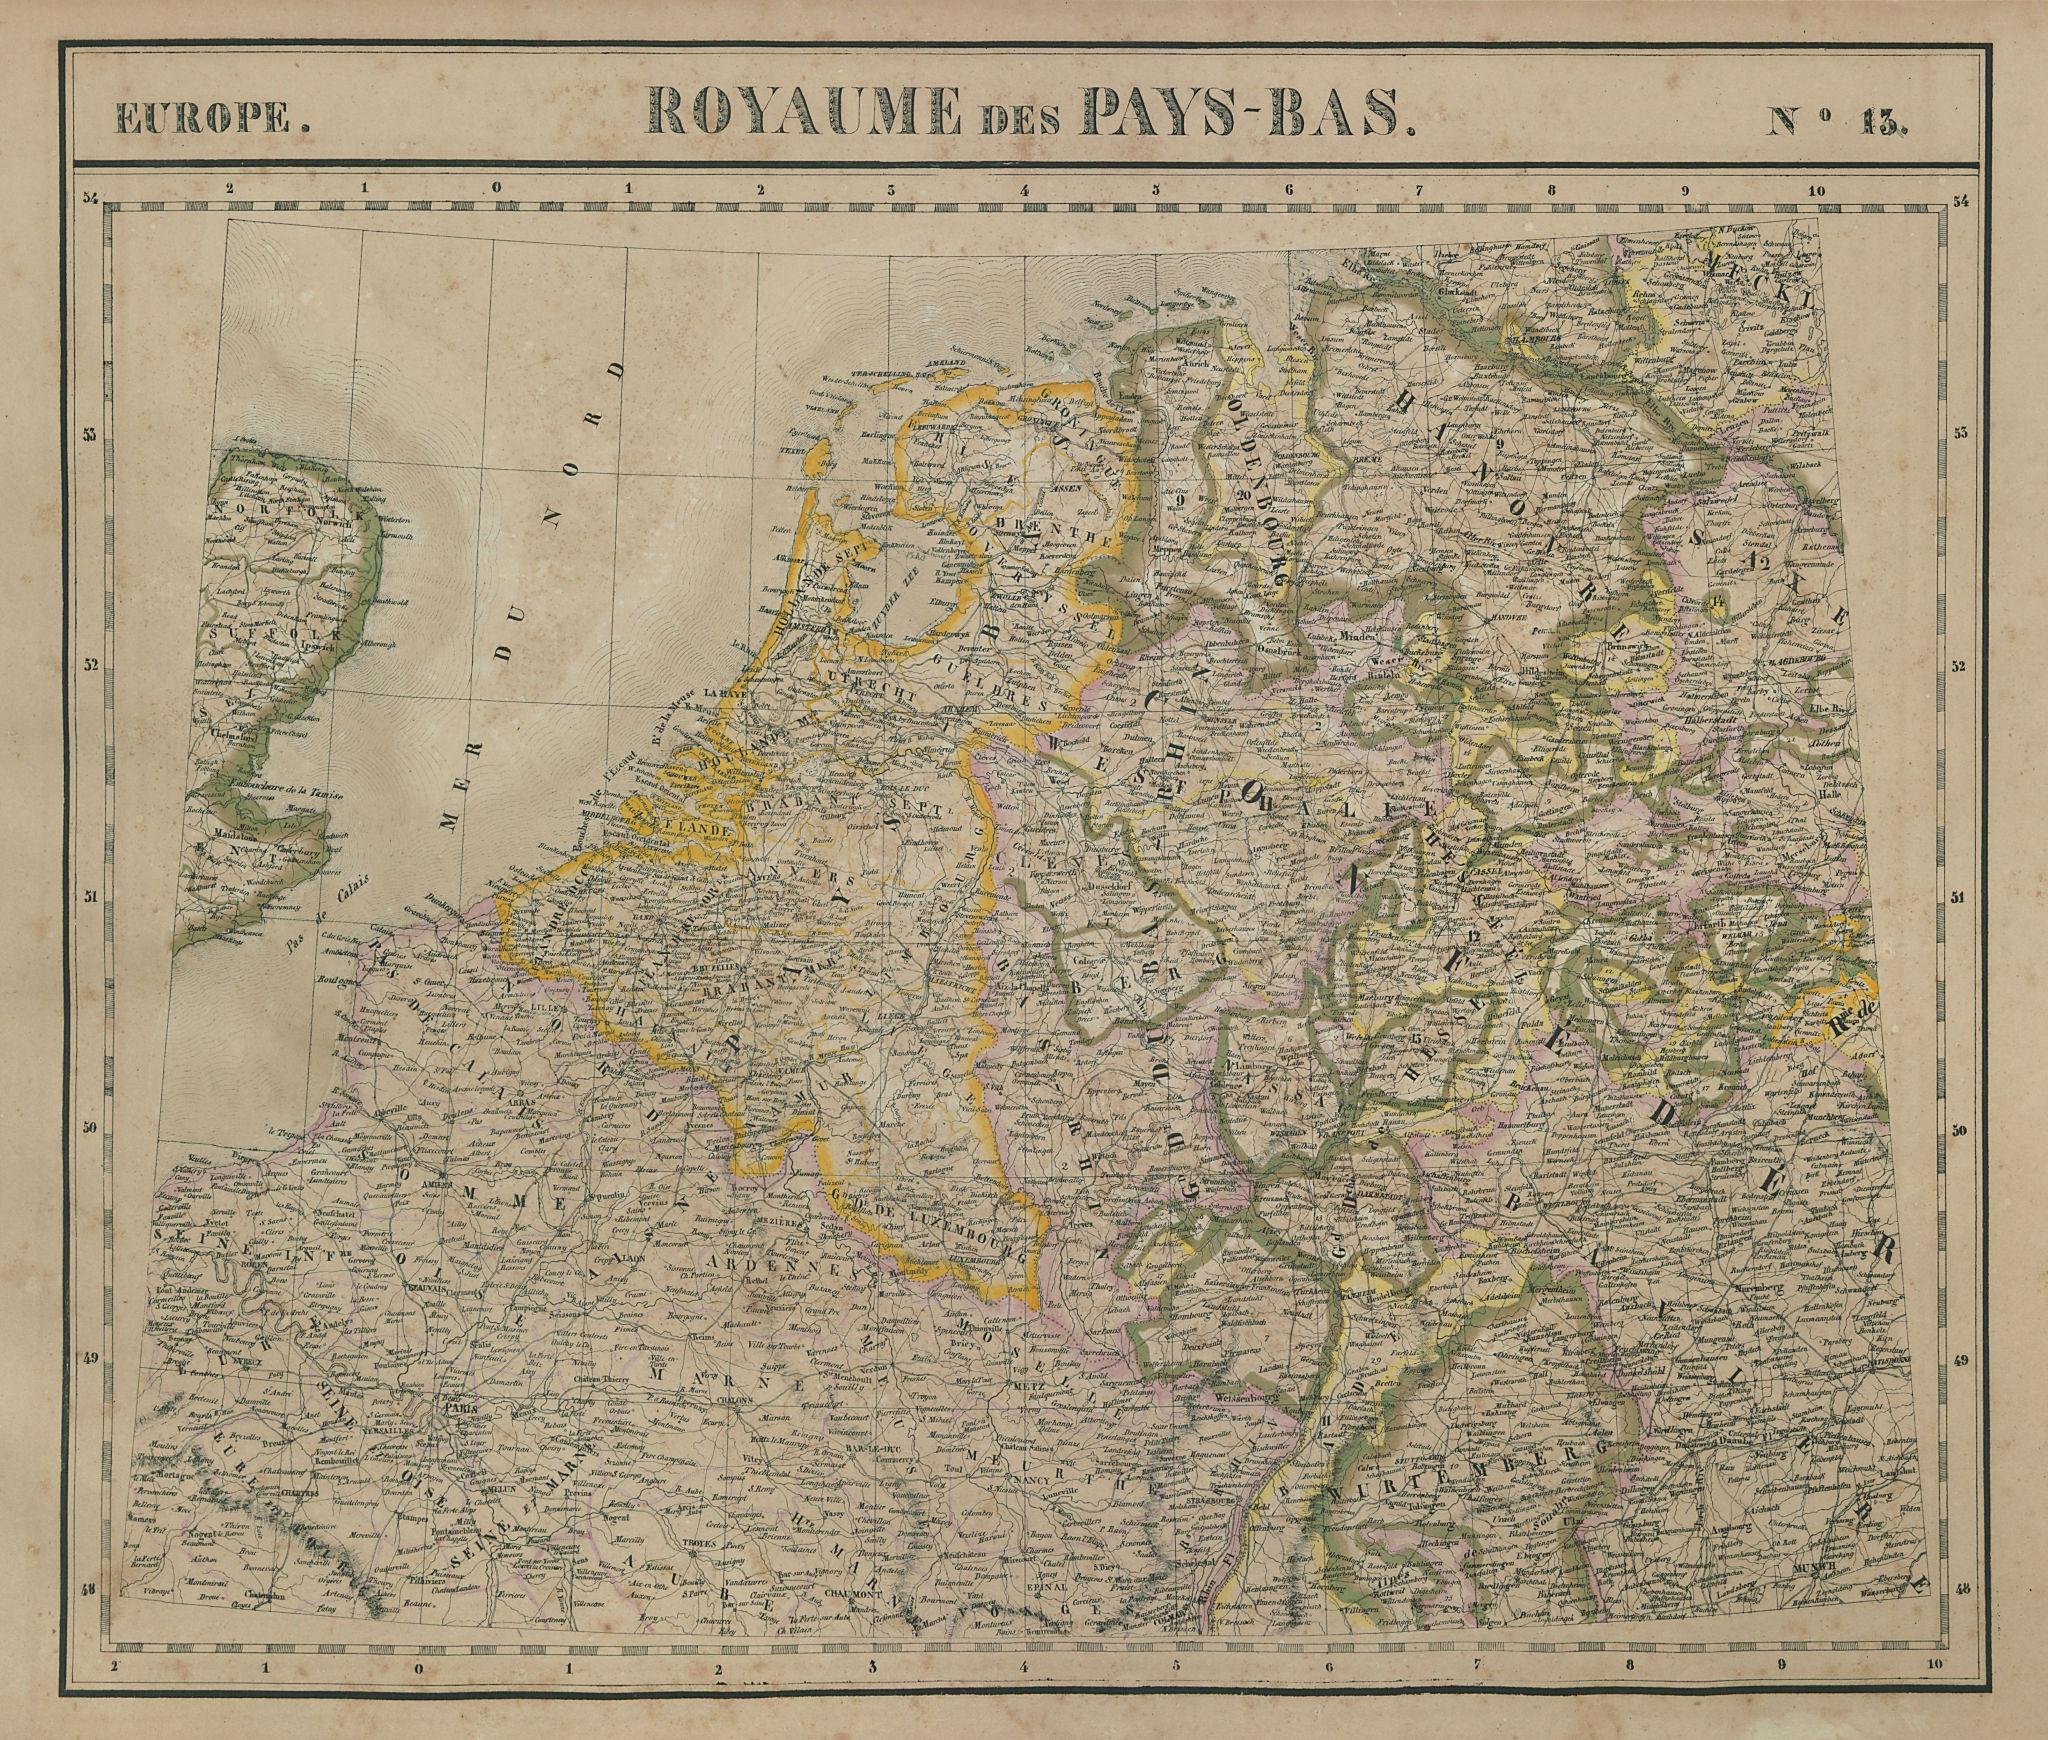 Europe. Royaume des Pays-Bas #13 NW Europe Benelux Germany VANDERMAELEN 1827 map